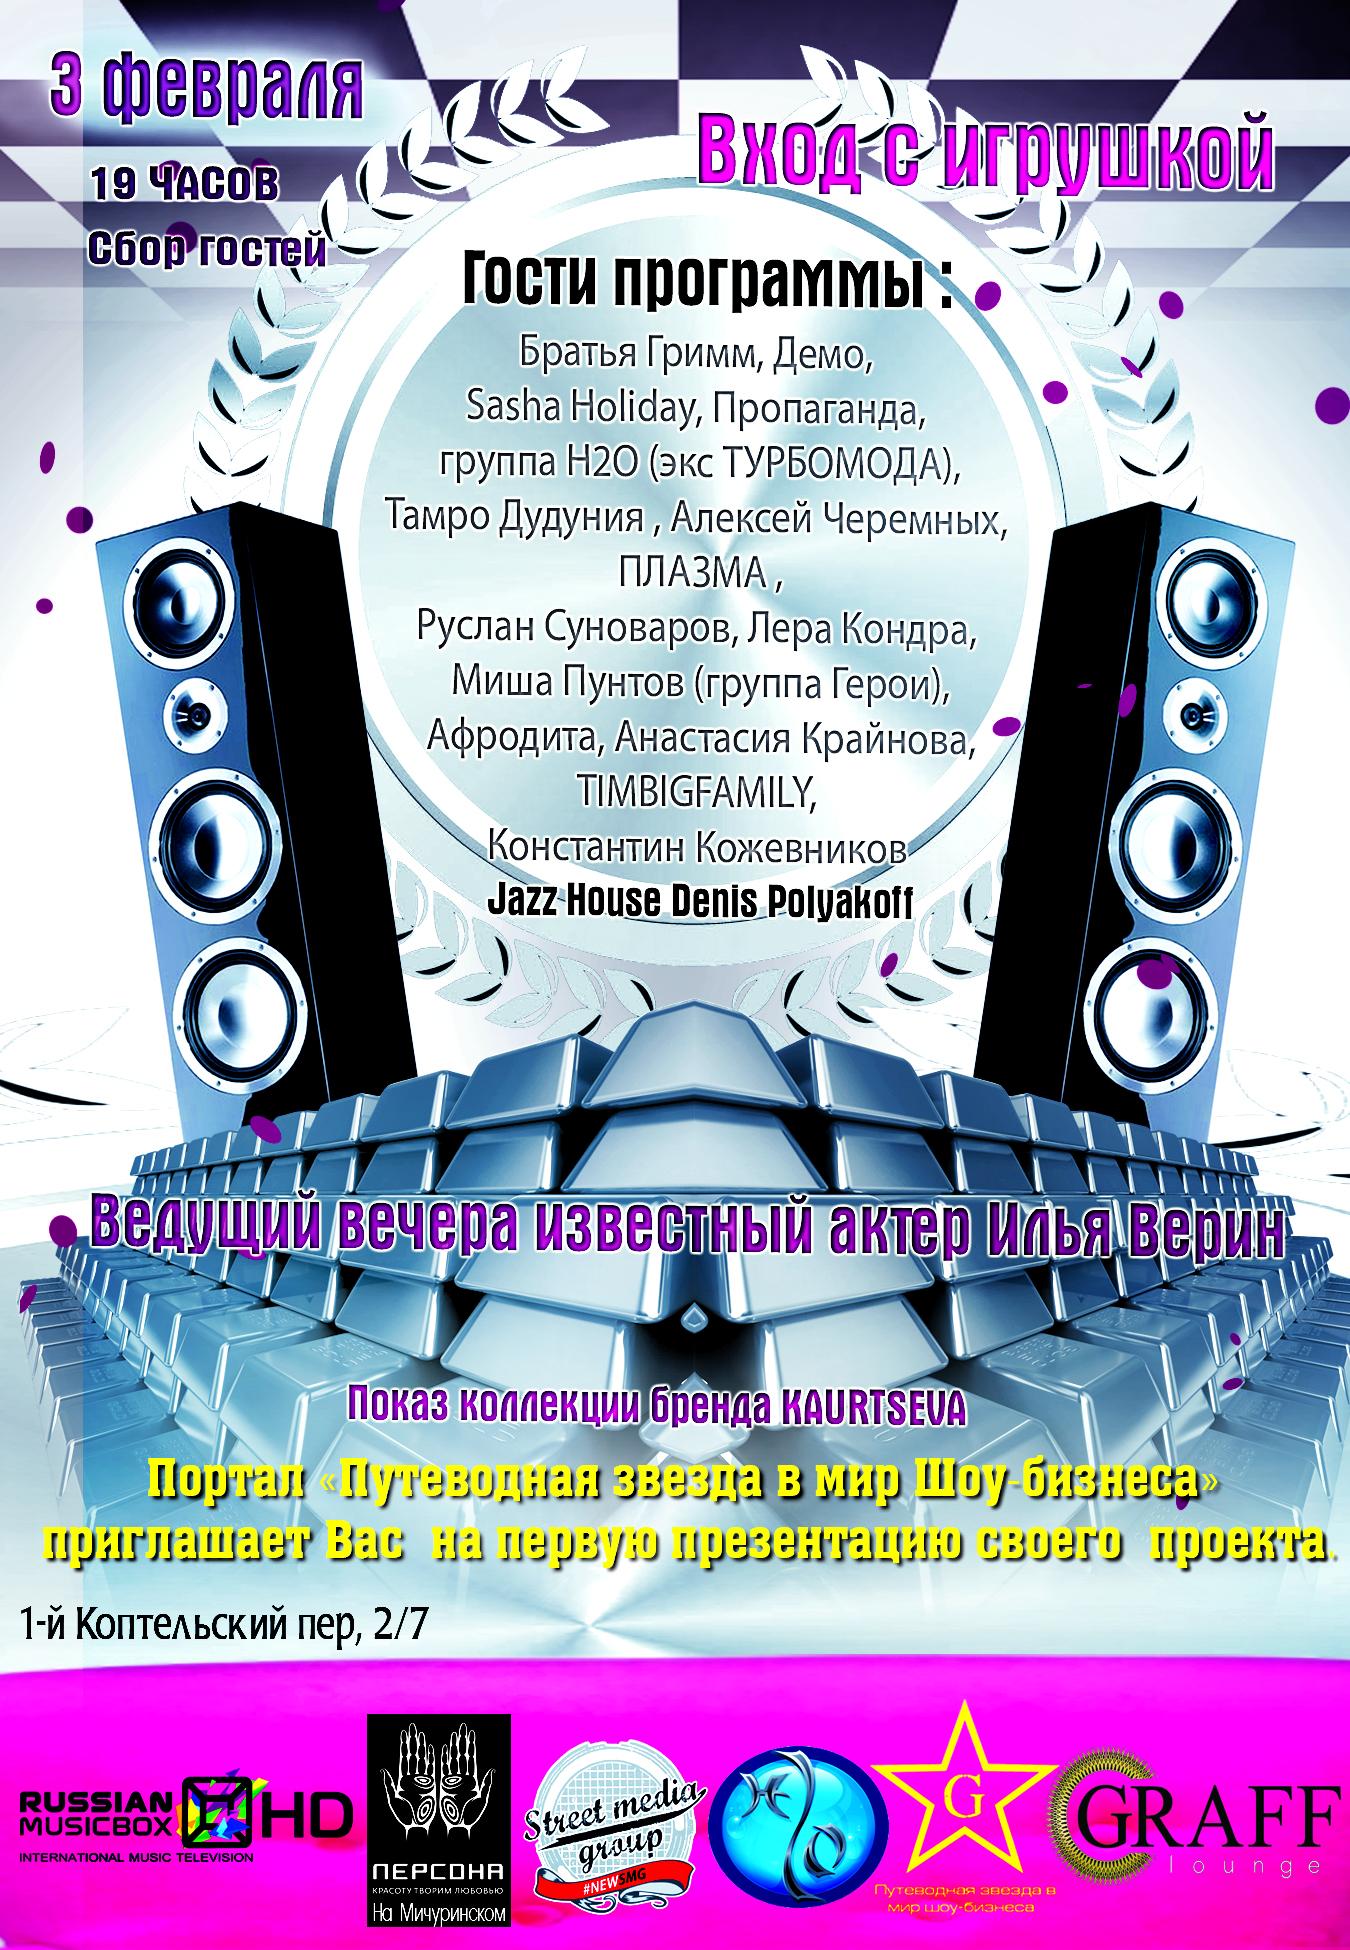 Группа H2O на презентации медиапортала Gleb Zvezda!